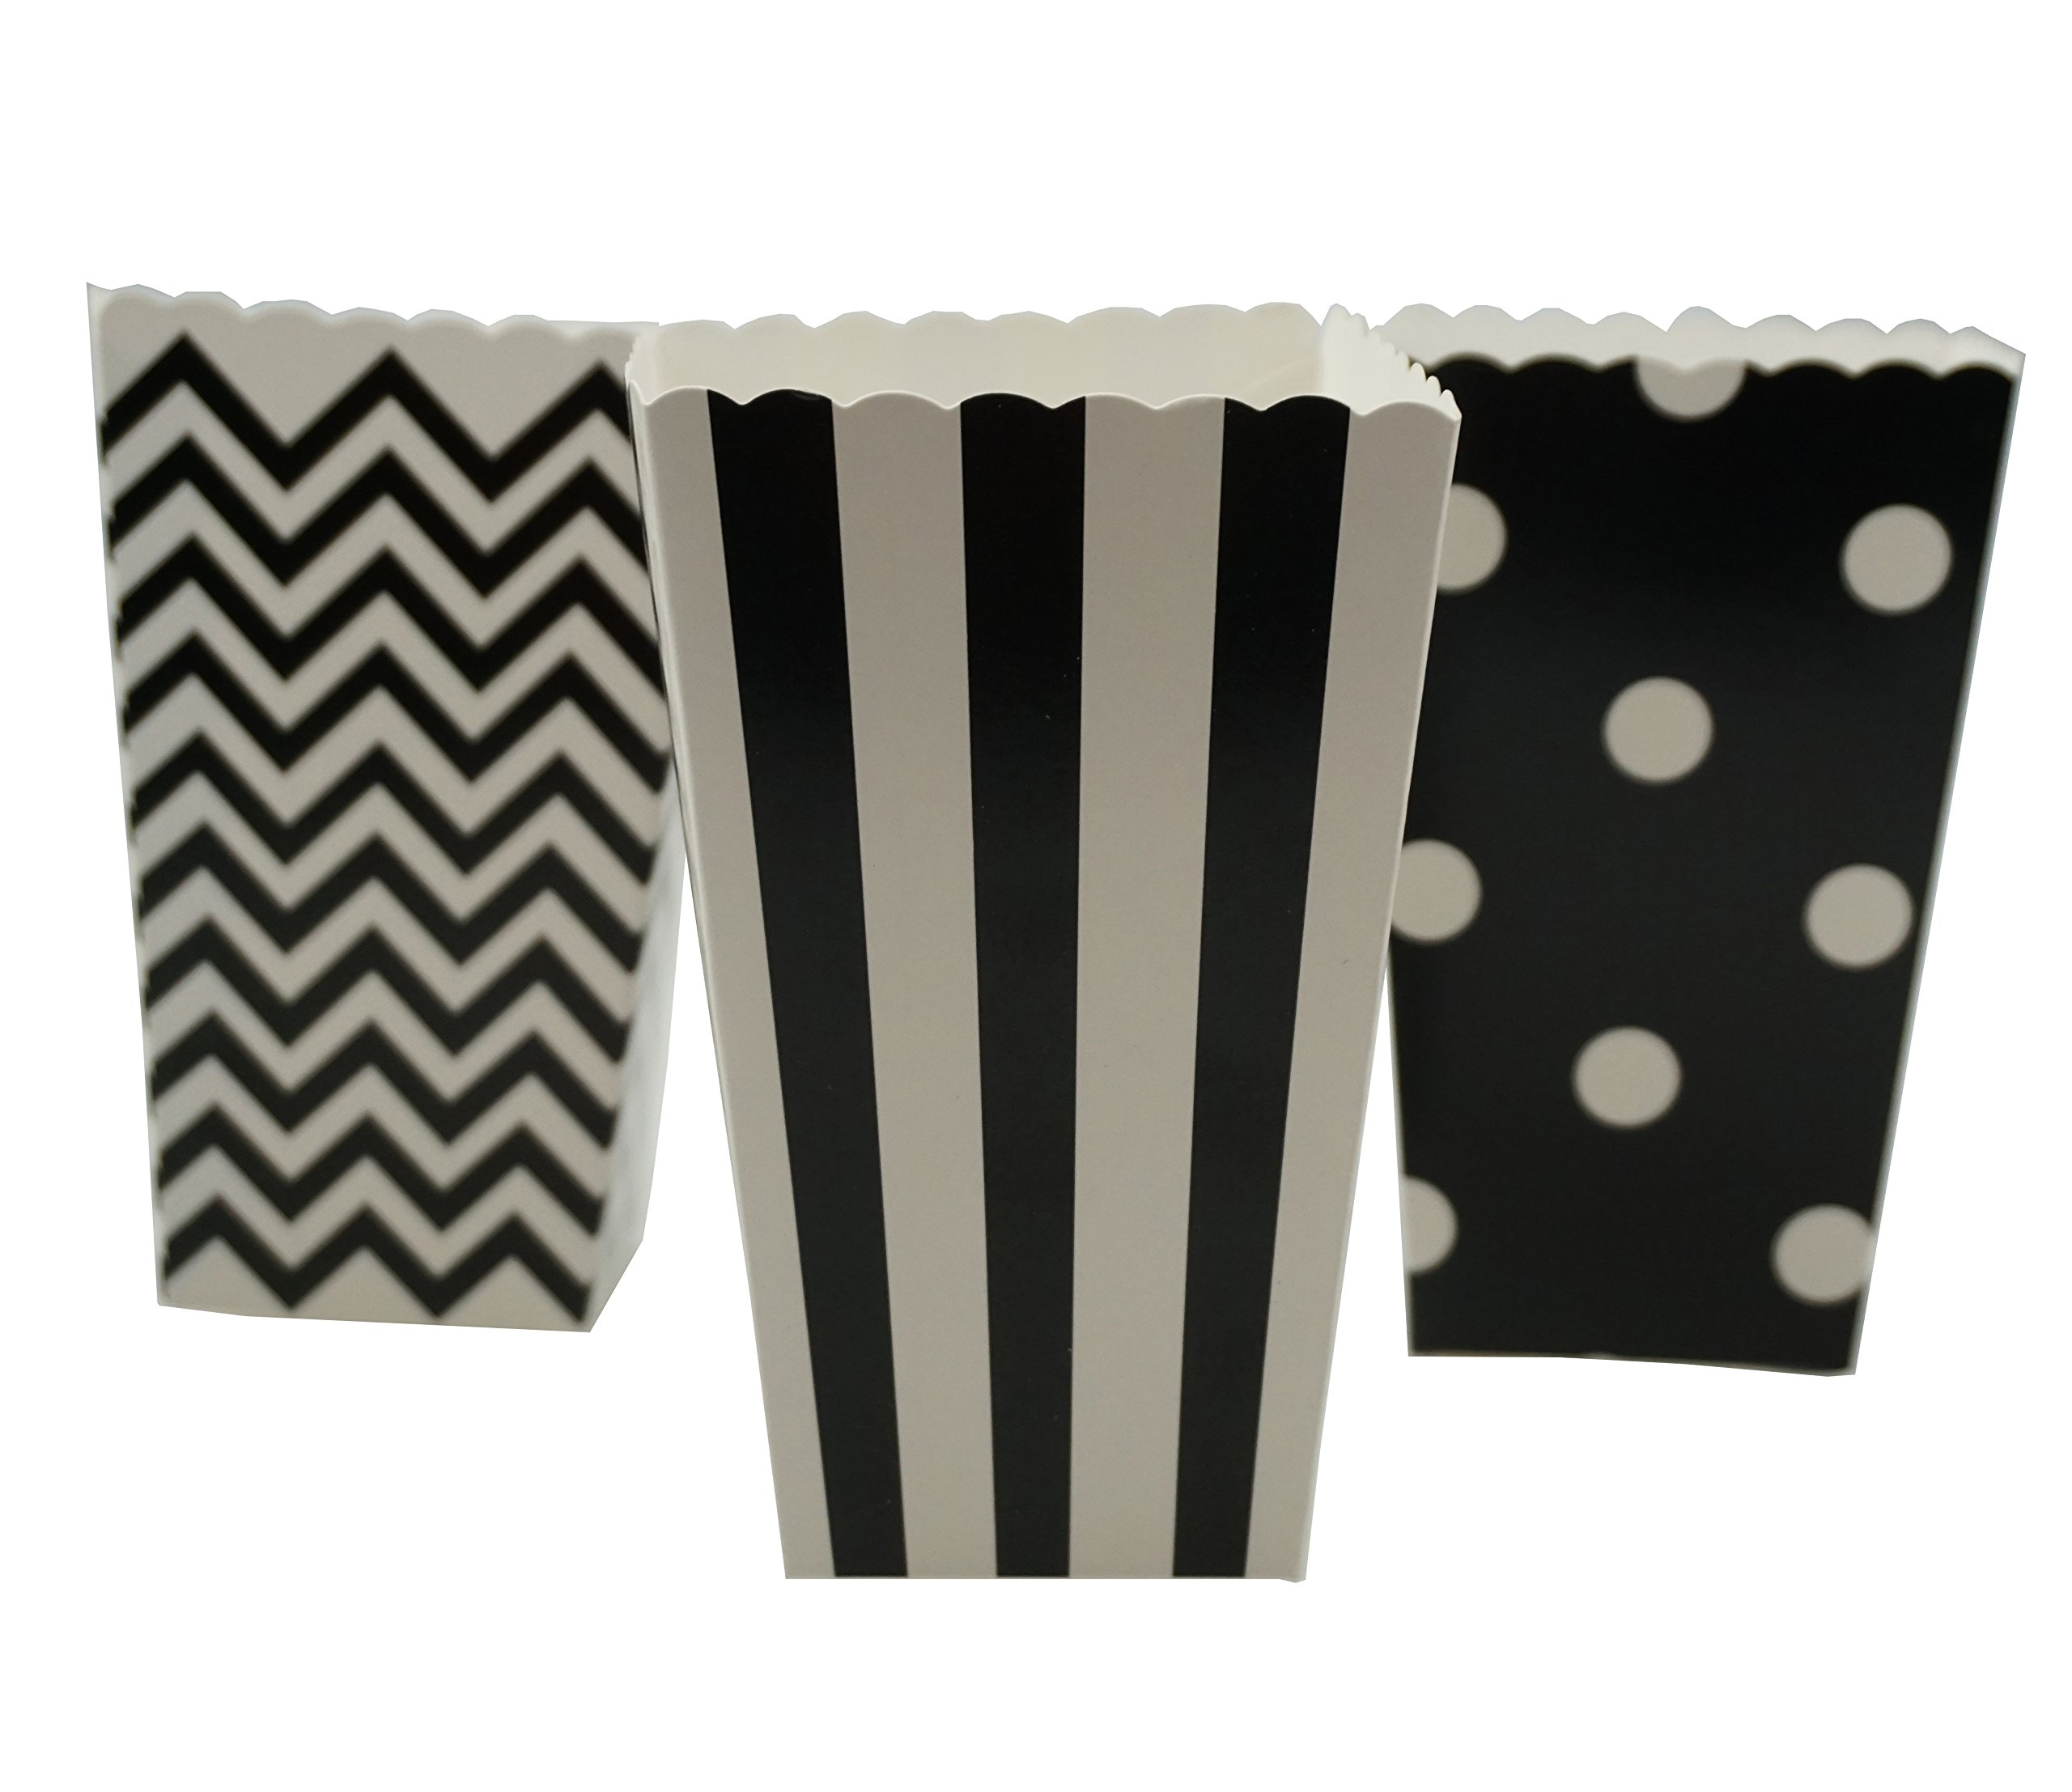 Bilipala Black Chevron Stripe and Polka Dot Paper Movie Popcorn Favor Boxes, 36 Counts